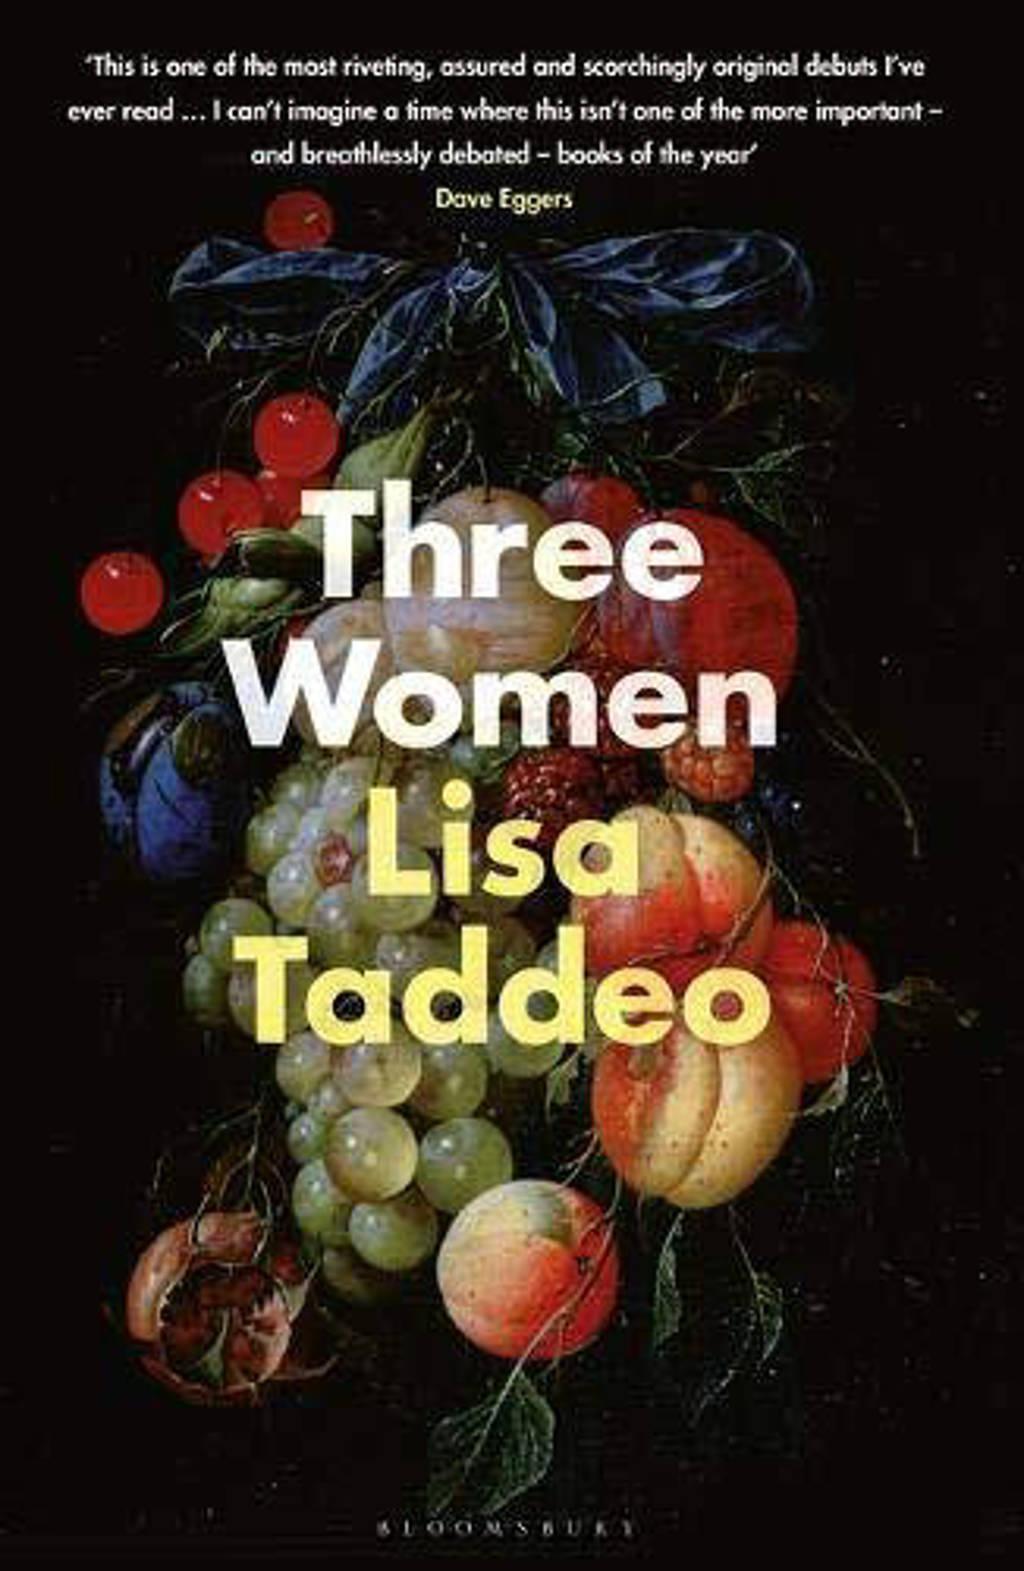 Three Women - Taddeo Lisa Taddeo